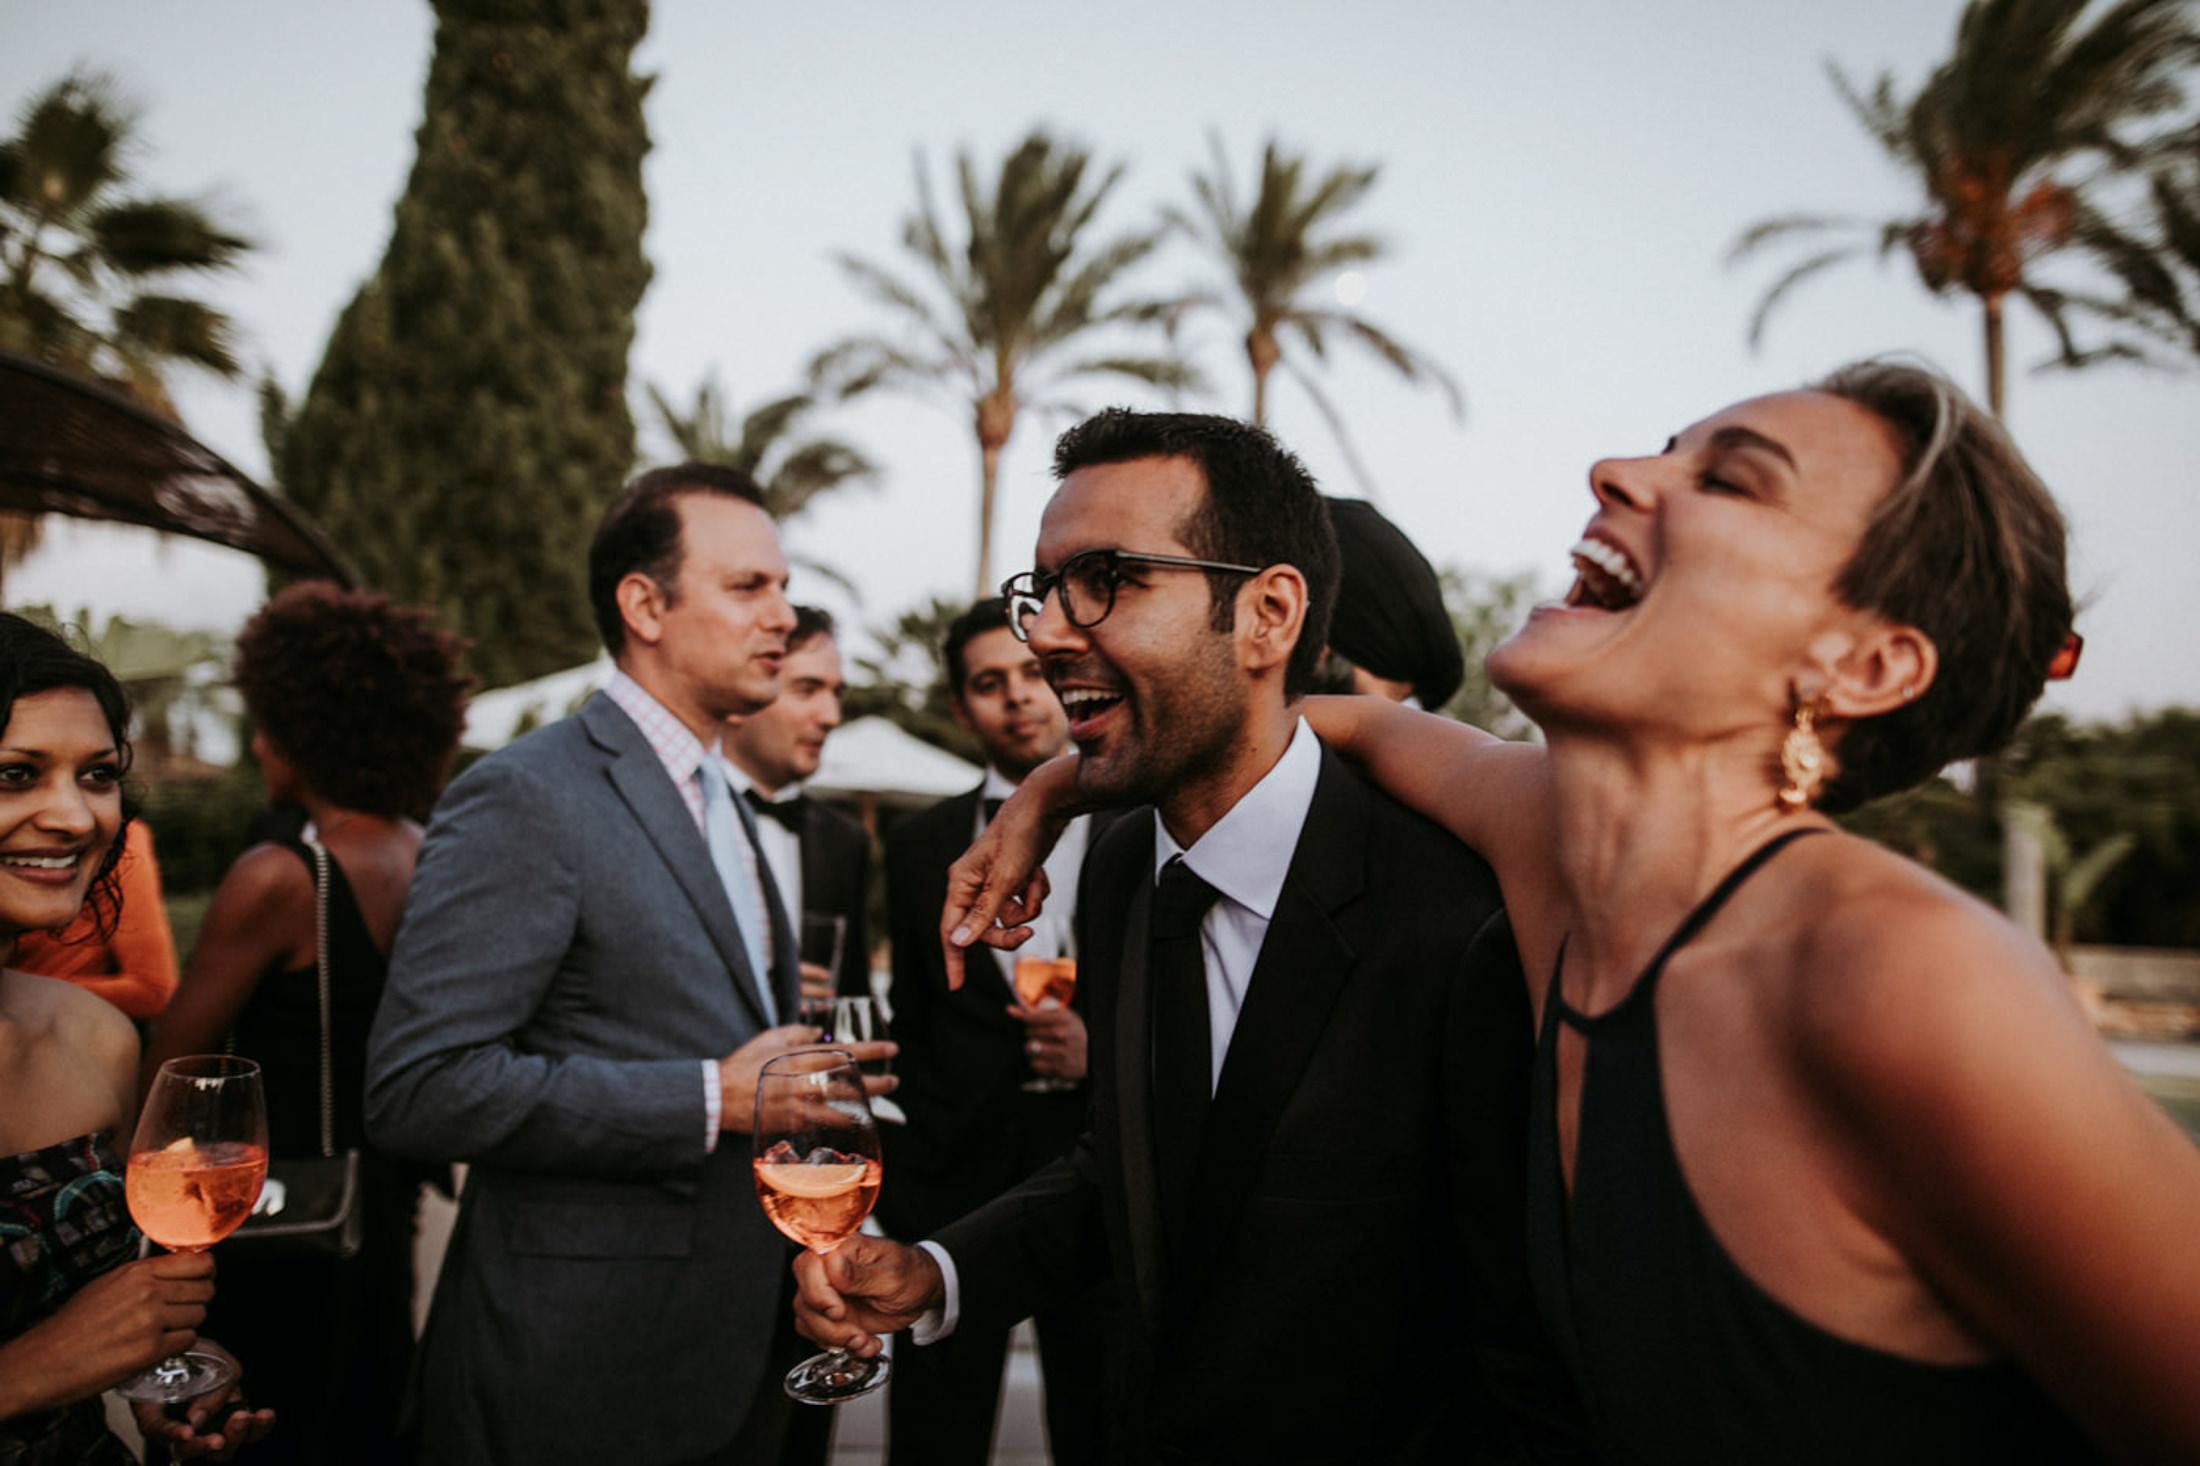 Wedding_Photographer_Mallorca_Daniela-Marquardt_Photography_New_York_Iceland_Tuscany_Santorini_Portugal_Austria_Bavaria_Elopement_Hochzeitsfotograf_AntjeRajat2_102